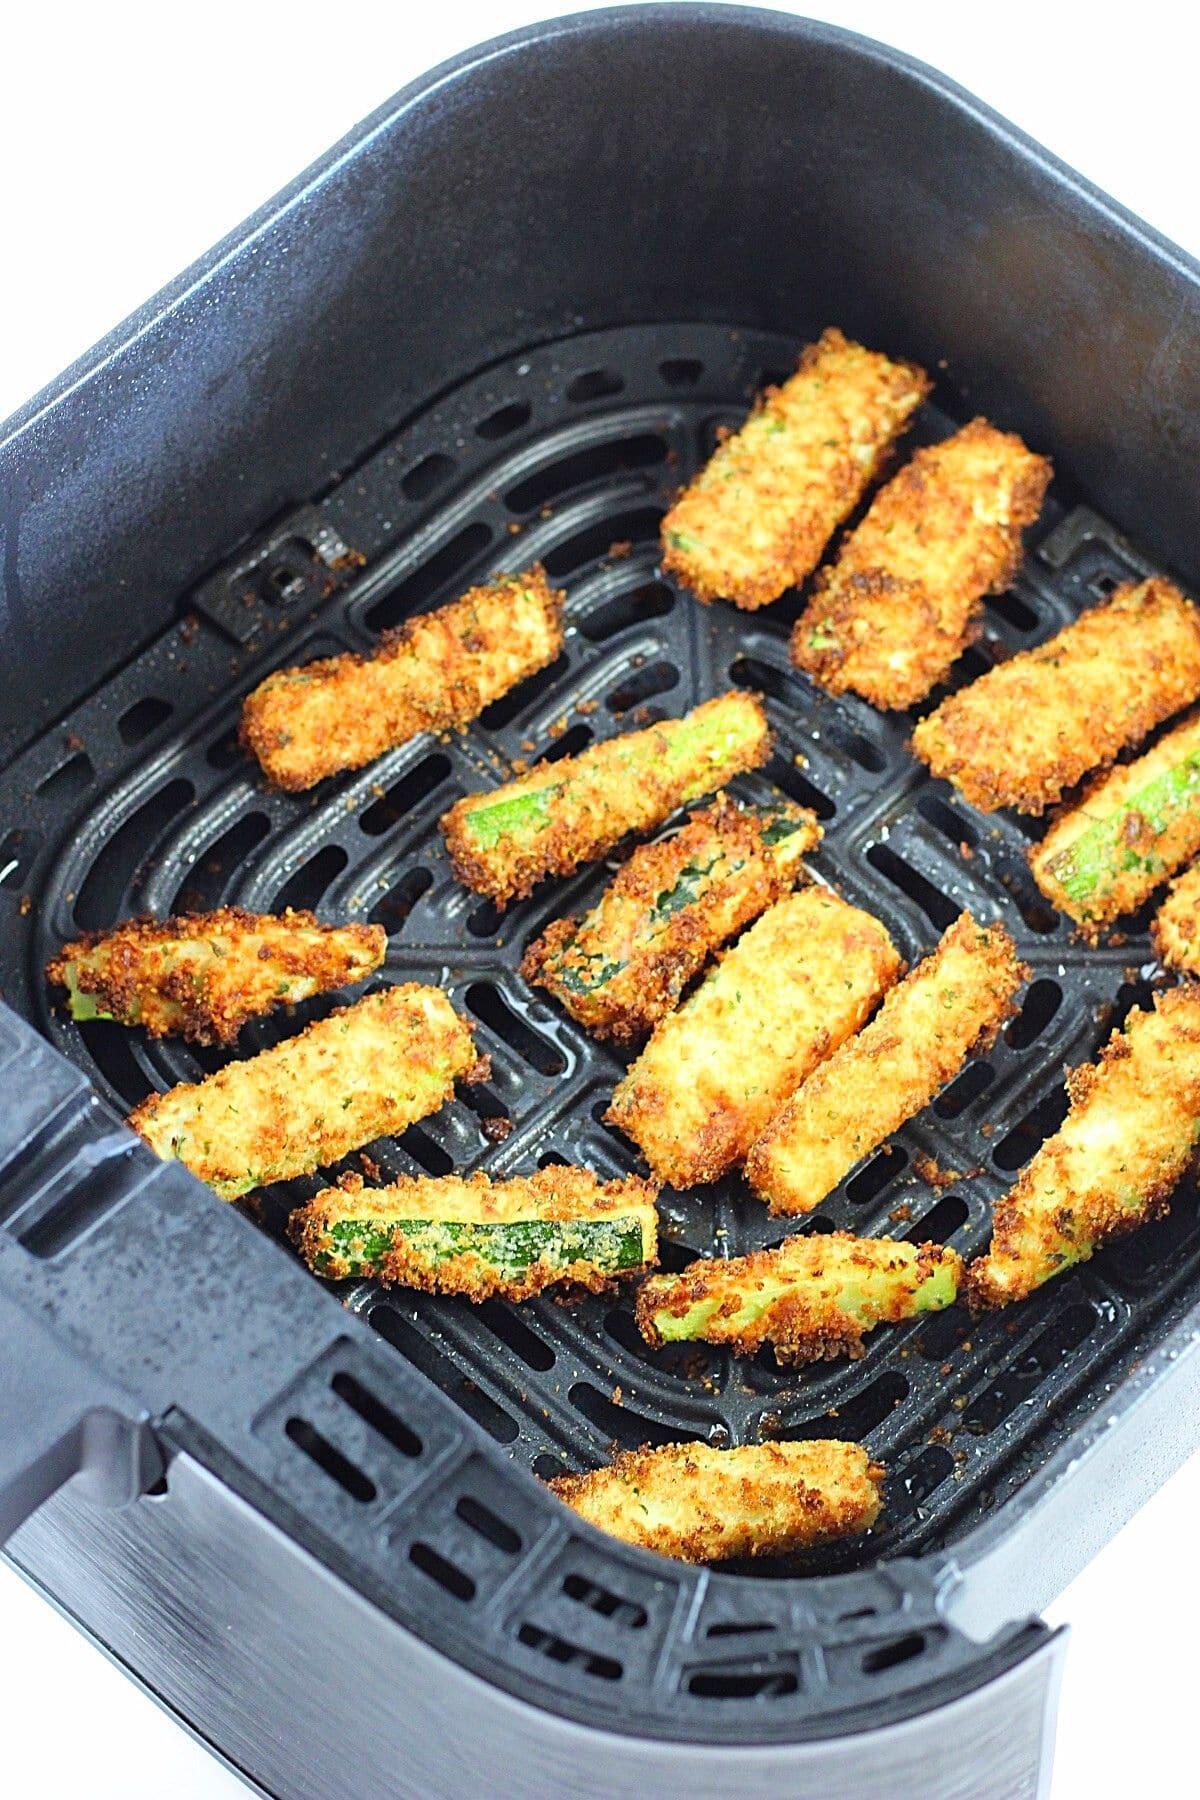 crispy breaded air fryer zucchini sticks in an air fryer basket